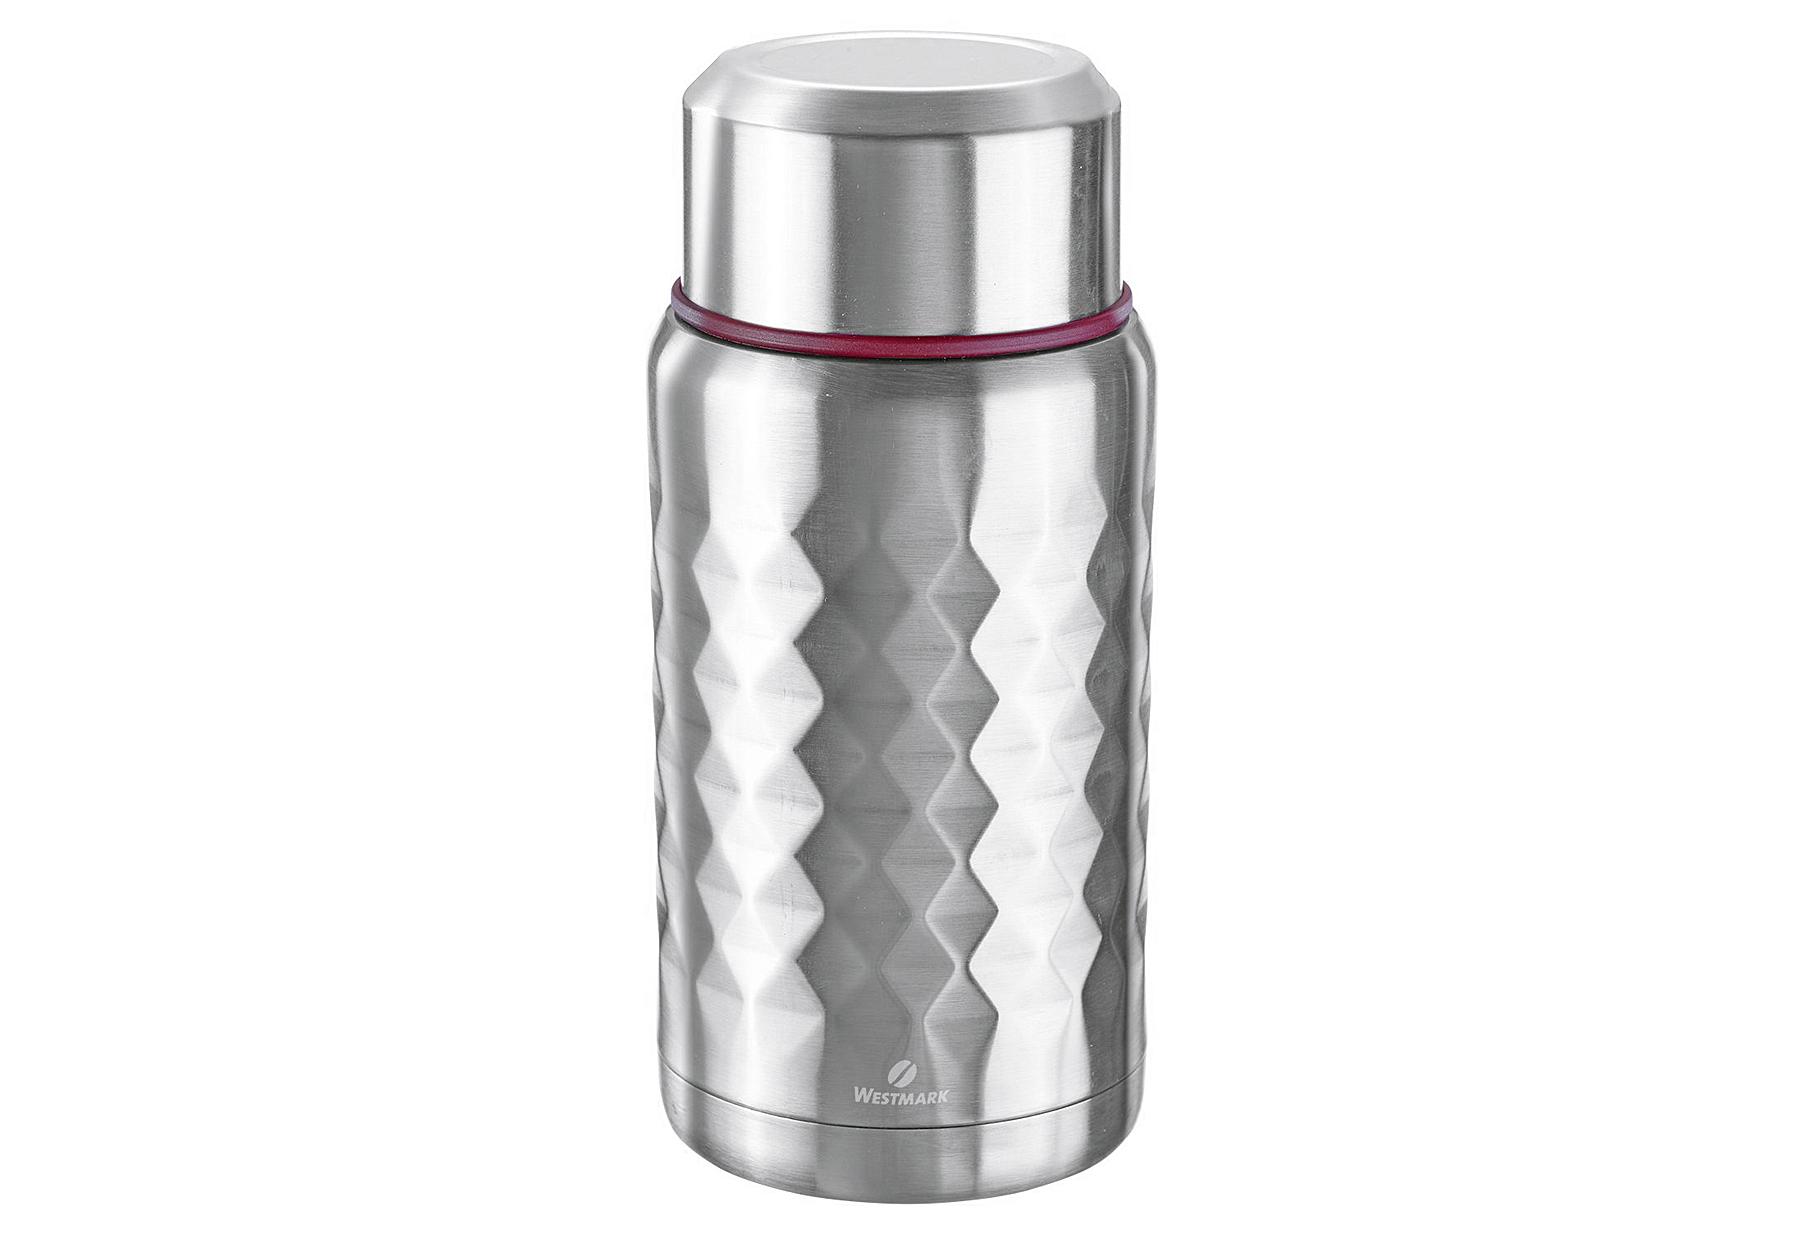 WESTMARK Lunch Pot/Speisebehälter Viva 0,75l silber